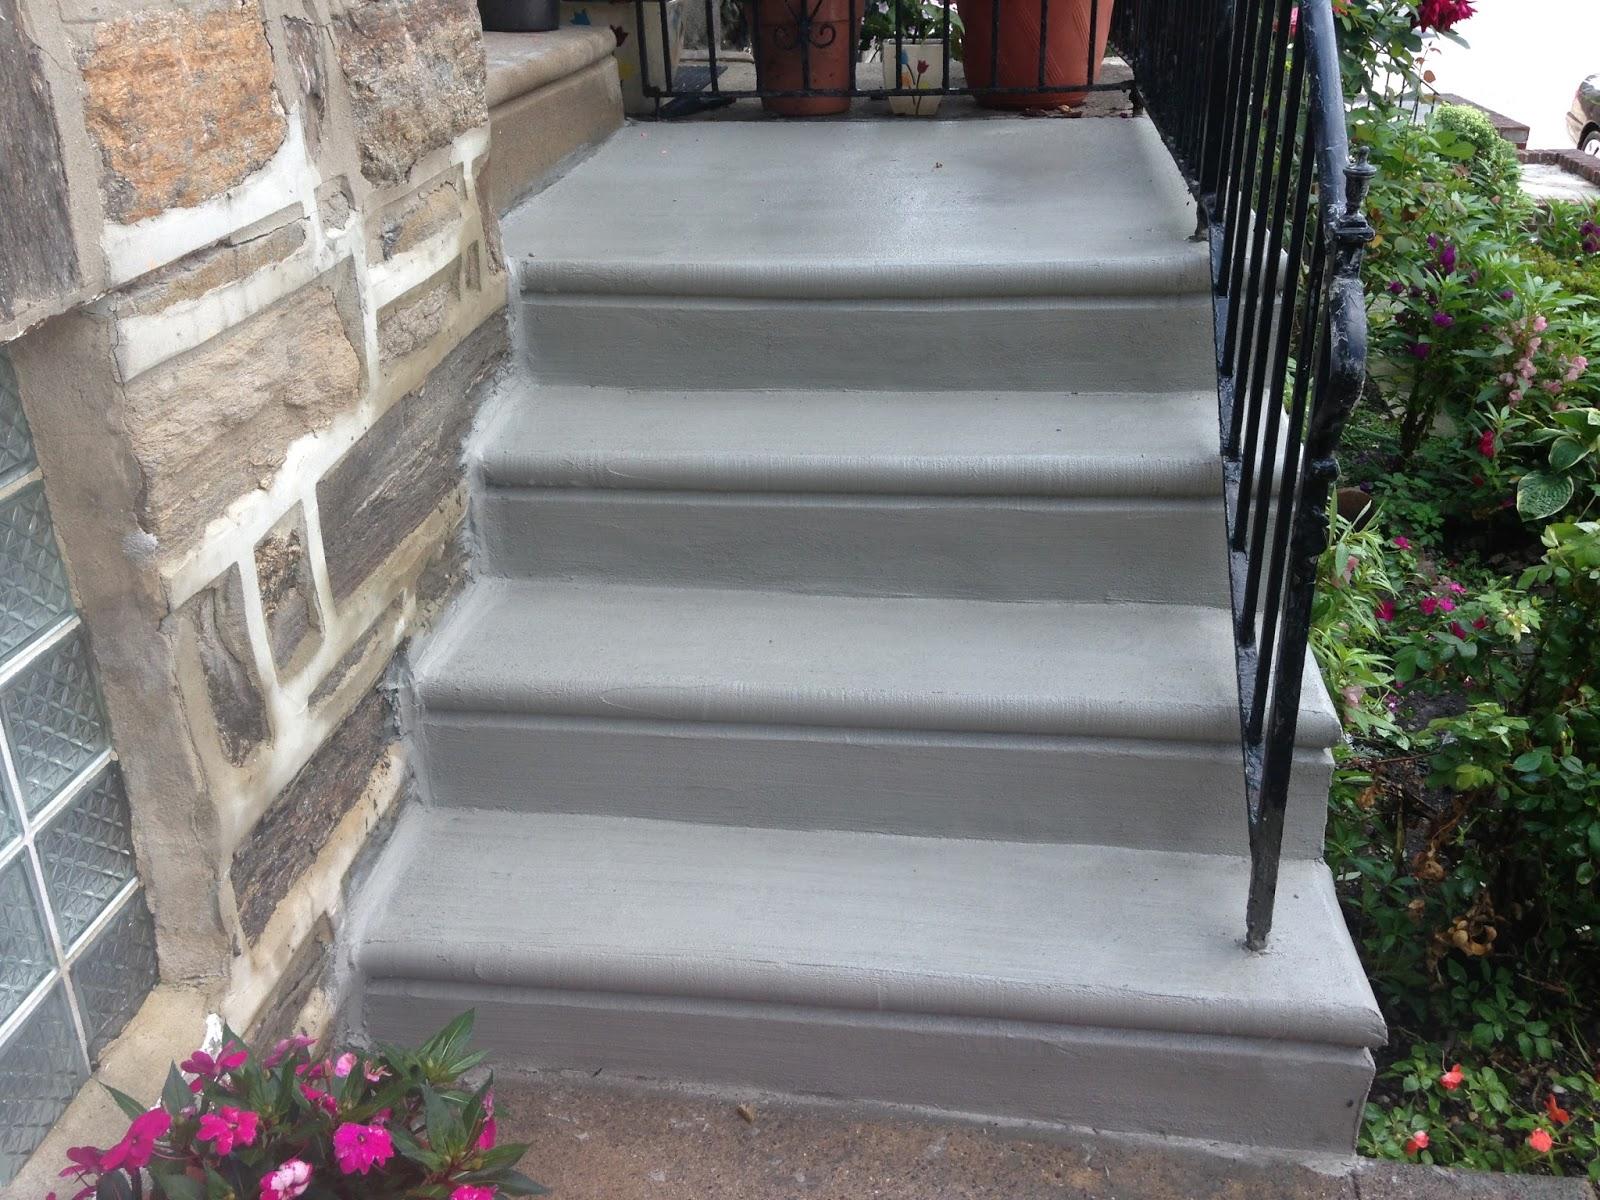 Philadelphia concrete contractor specialist how to - Resurfacing exterior concrete stairs ...